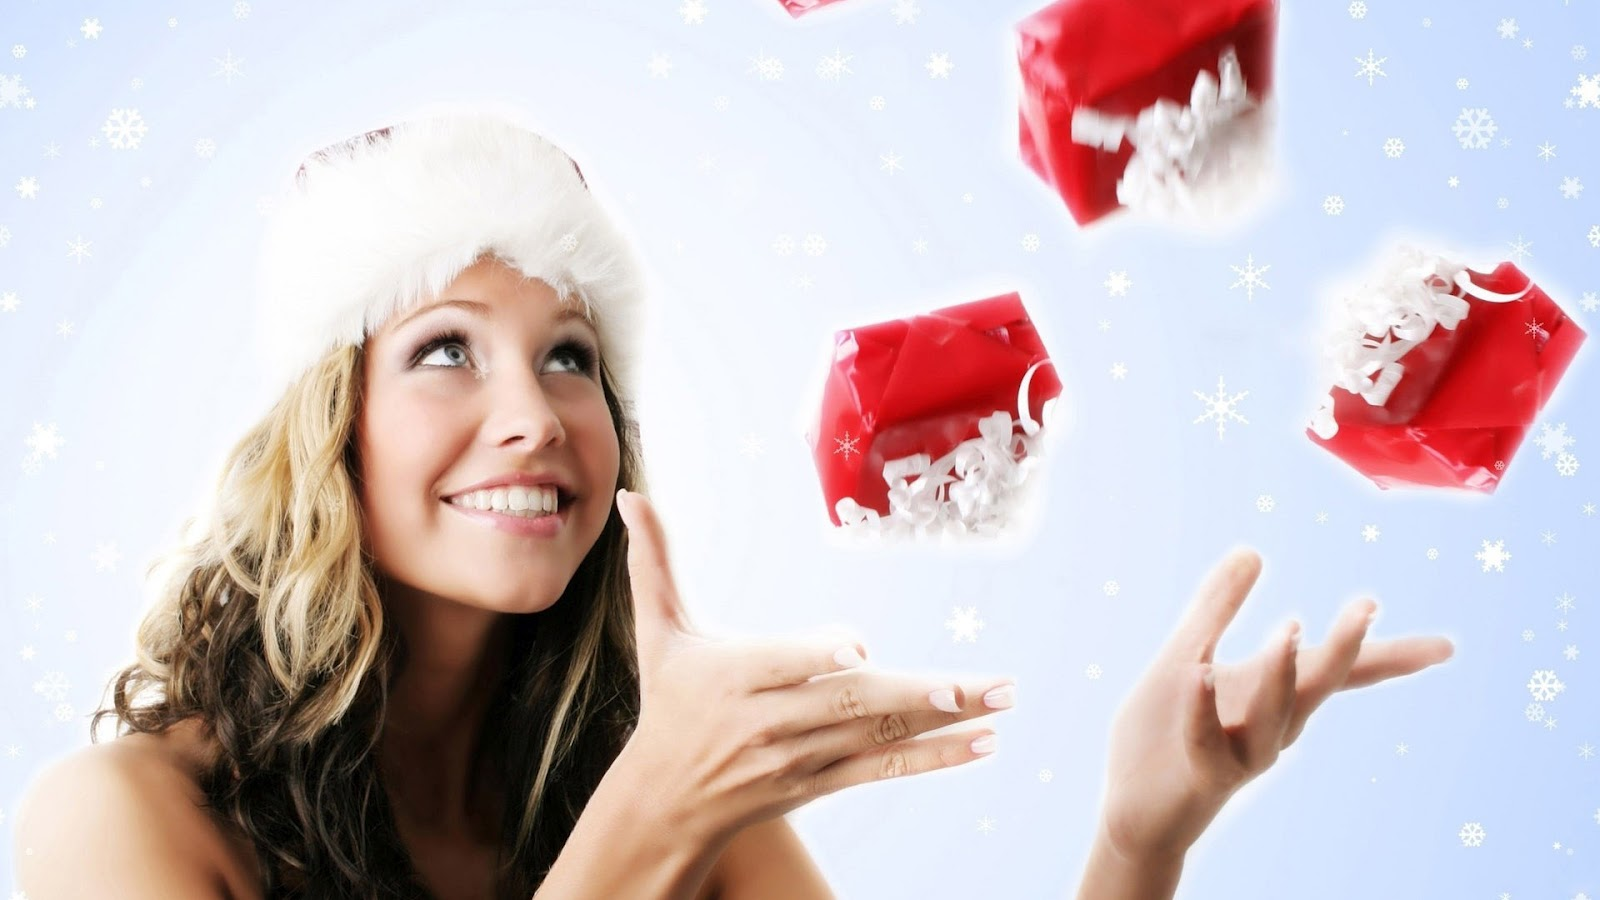 http://2.bp.blogspot.com/-k02Ux36JY6c/UBvs9s8_7JI/AAAAAAAAJuE/YIuDkgObBM0/s1600/beautiful-christmas-a-catching-presents.jpg